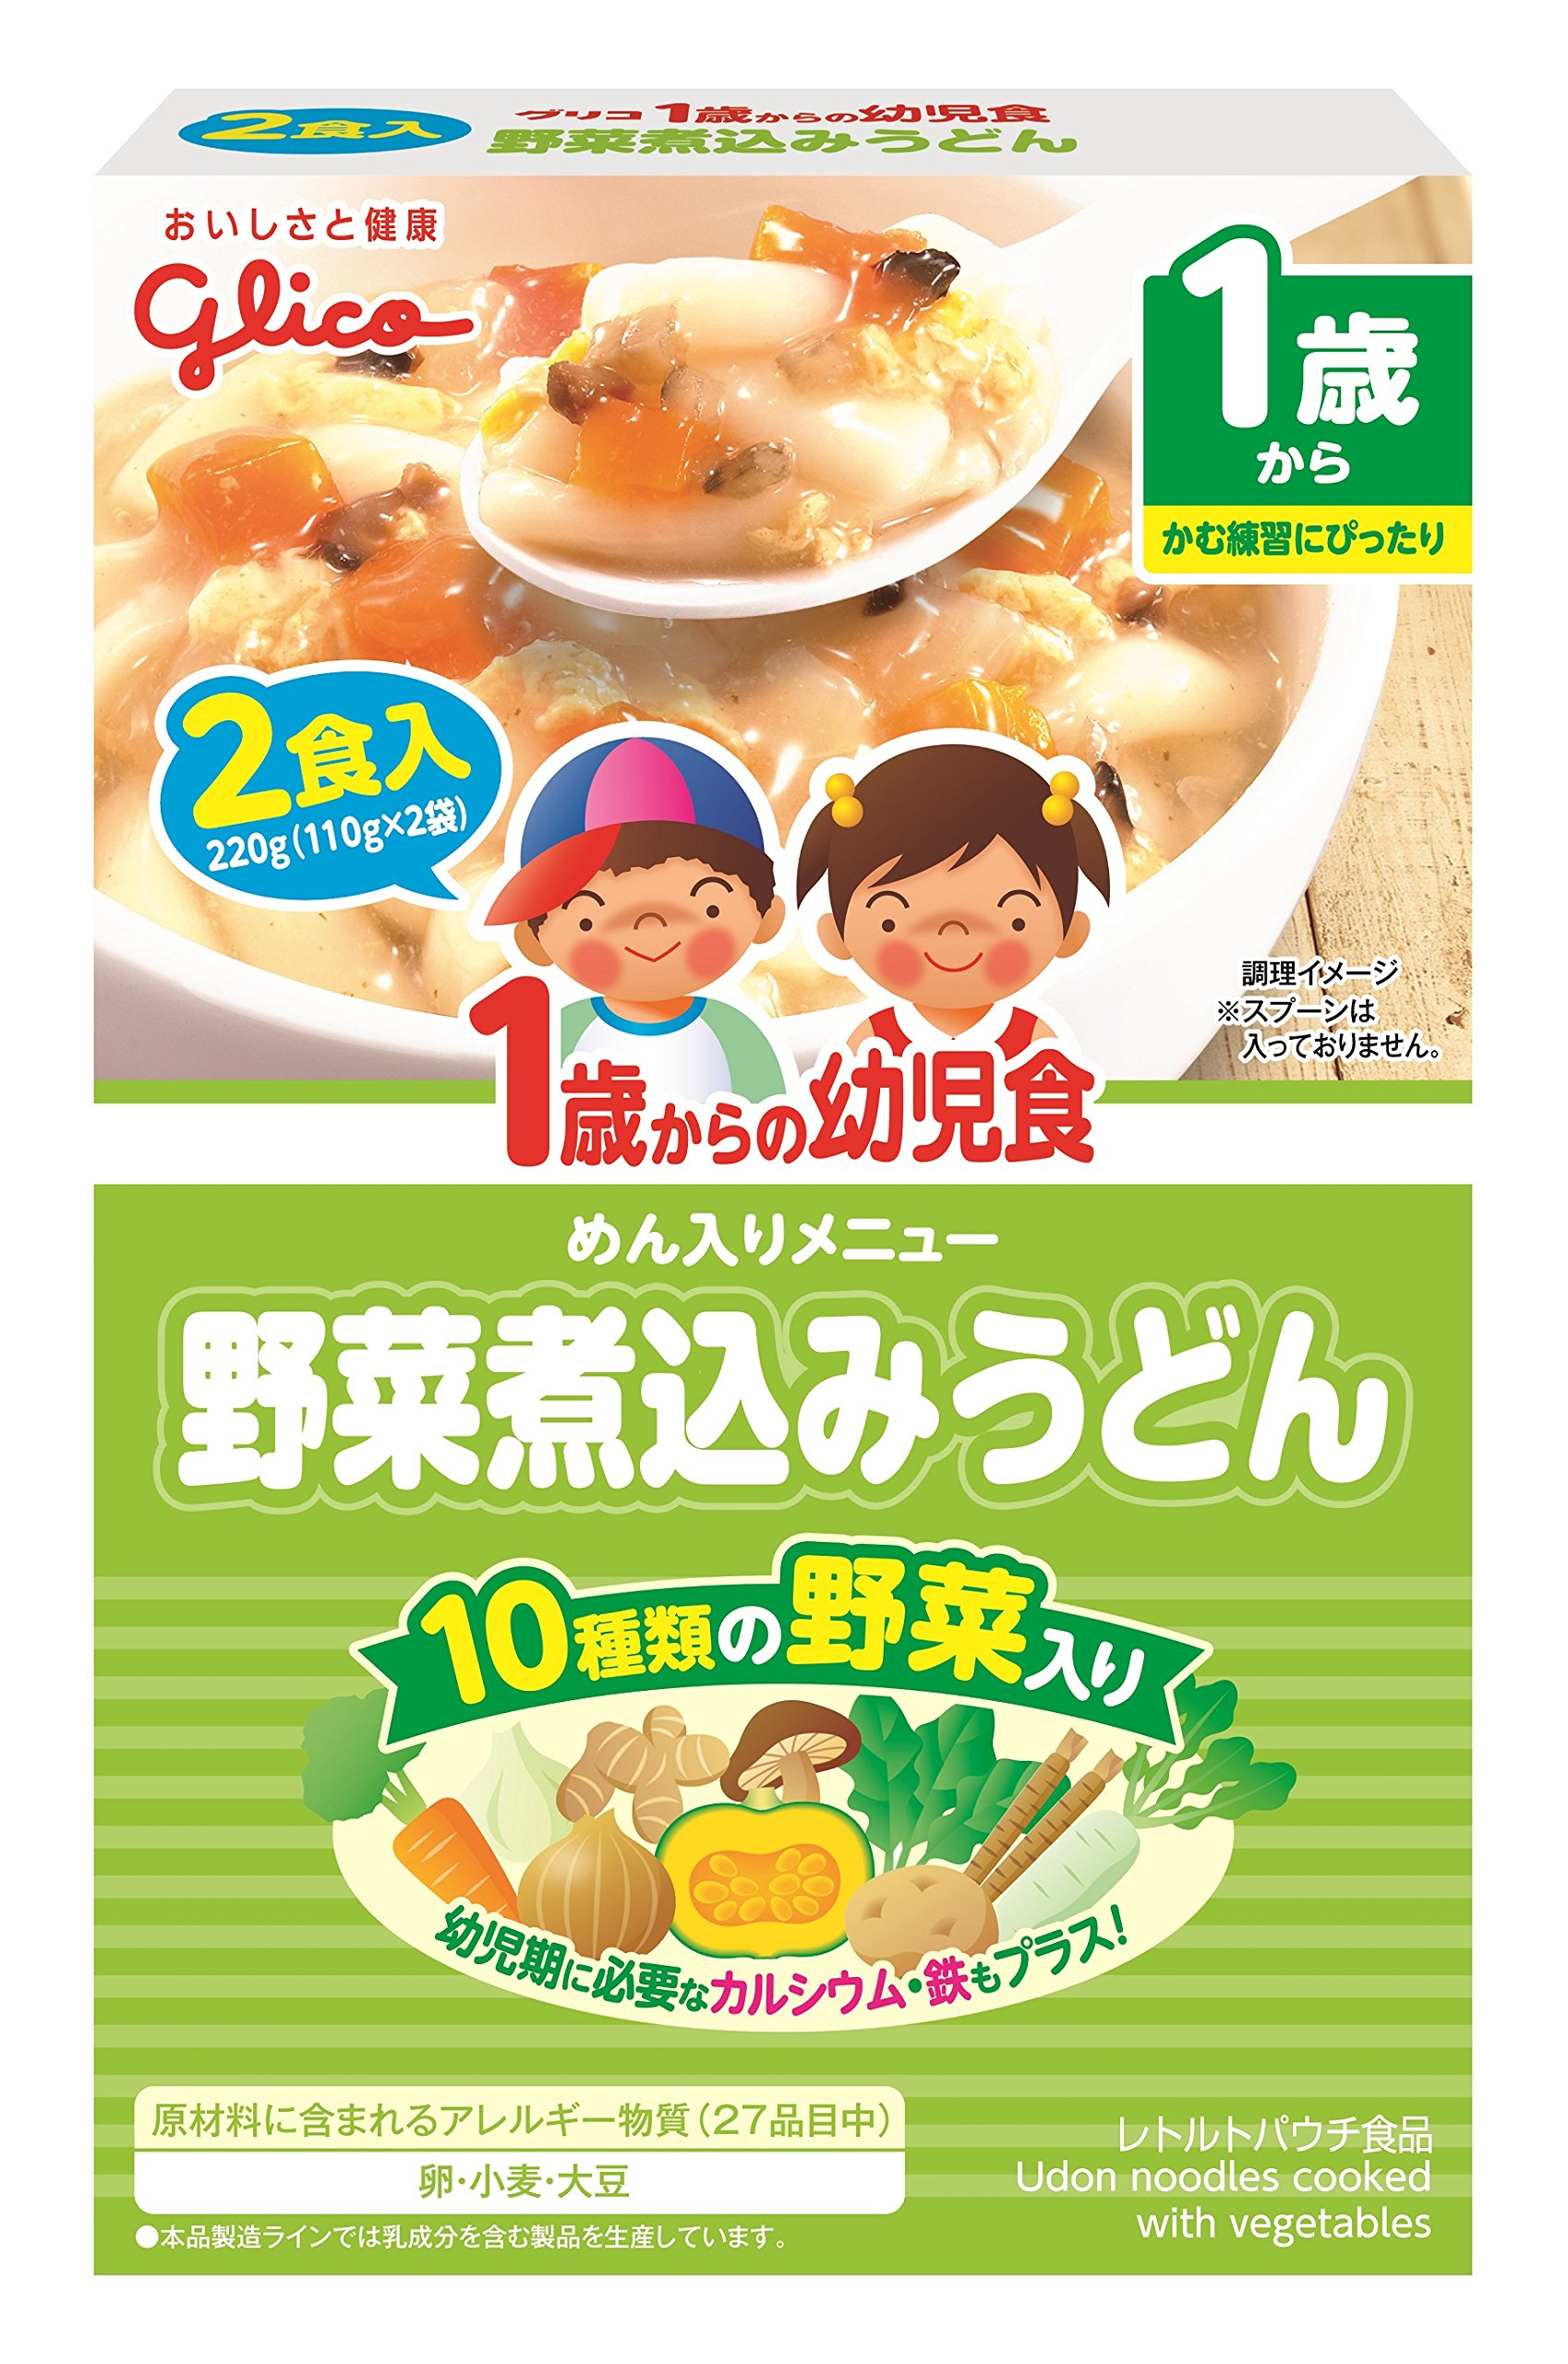 2 Kuii X5 or infant food vegetable stew noodles